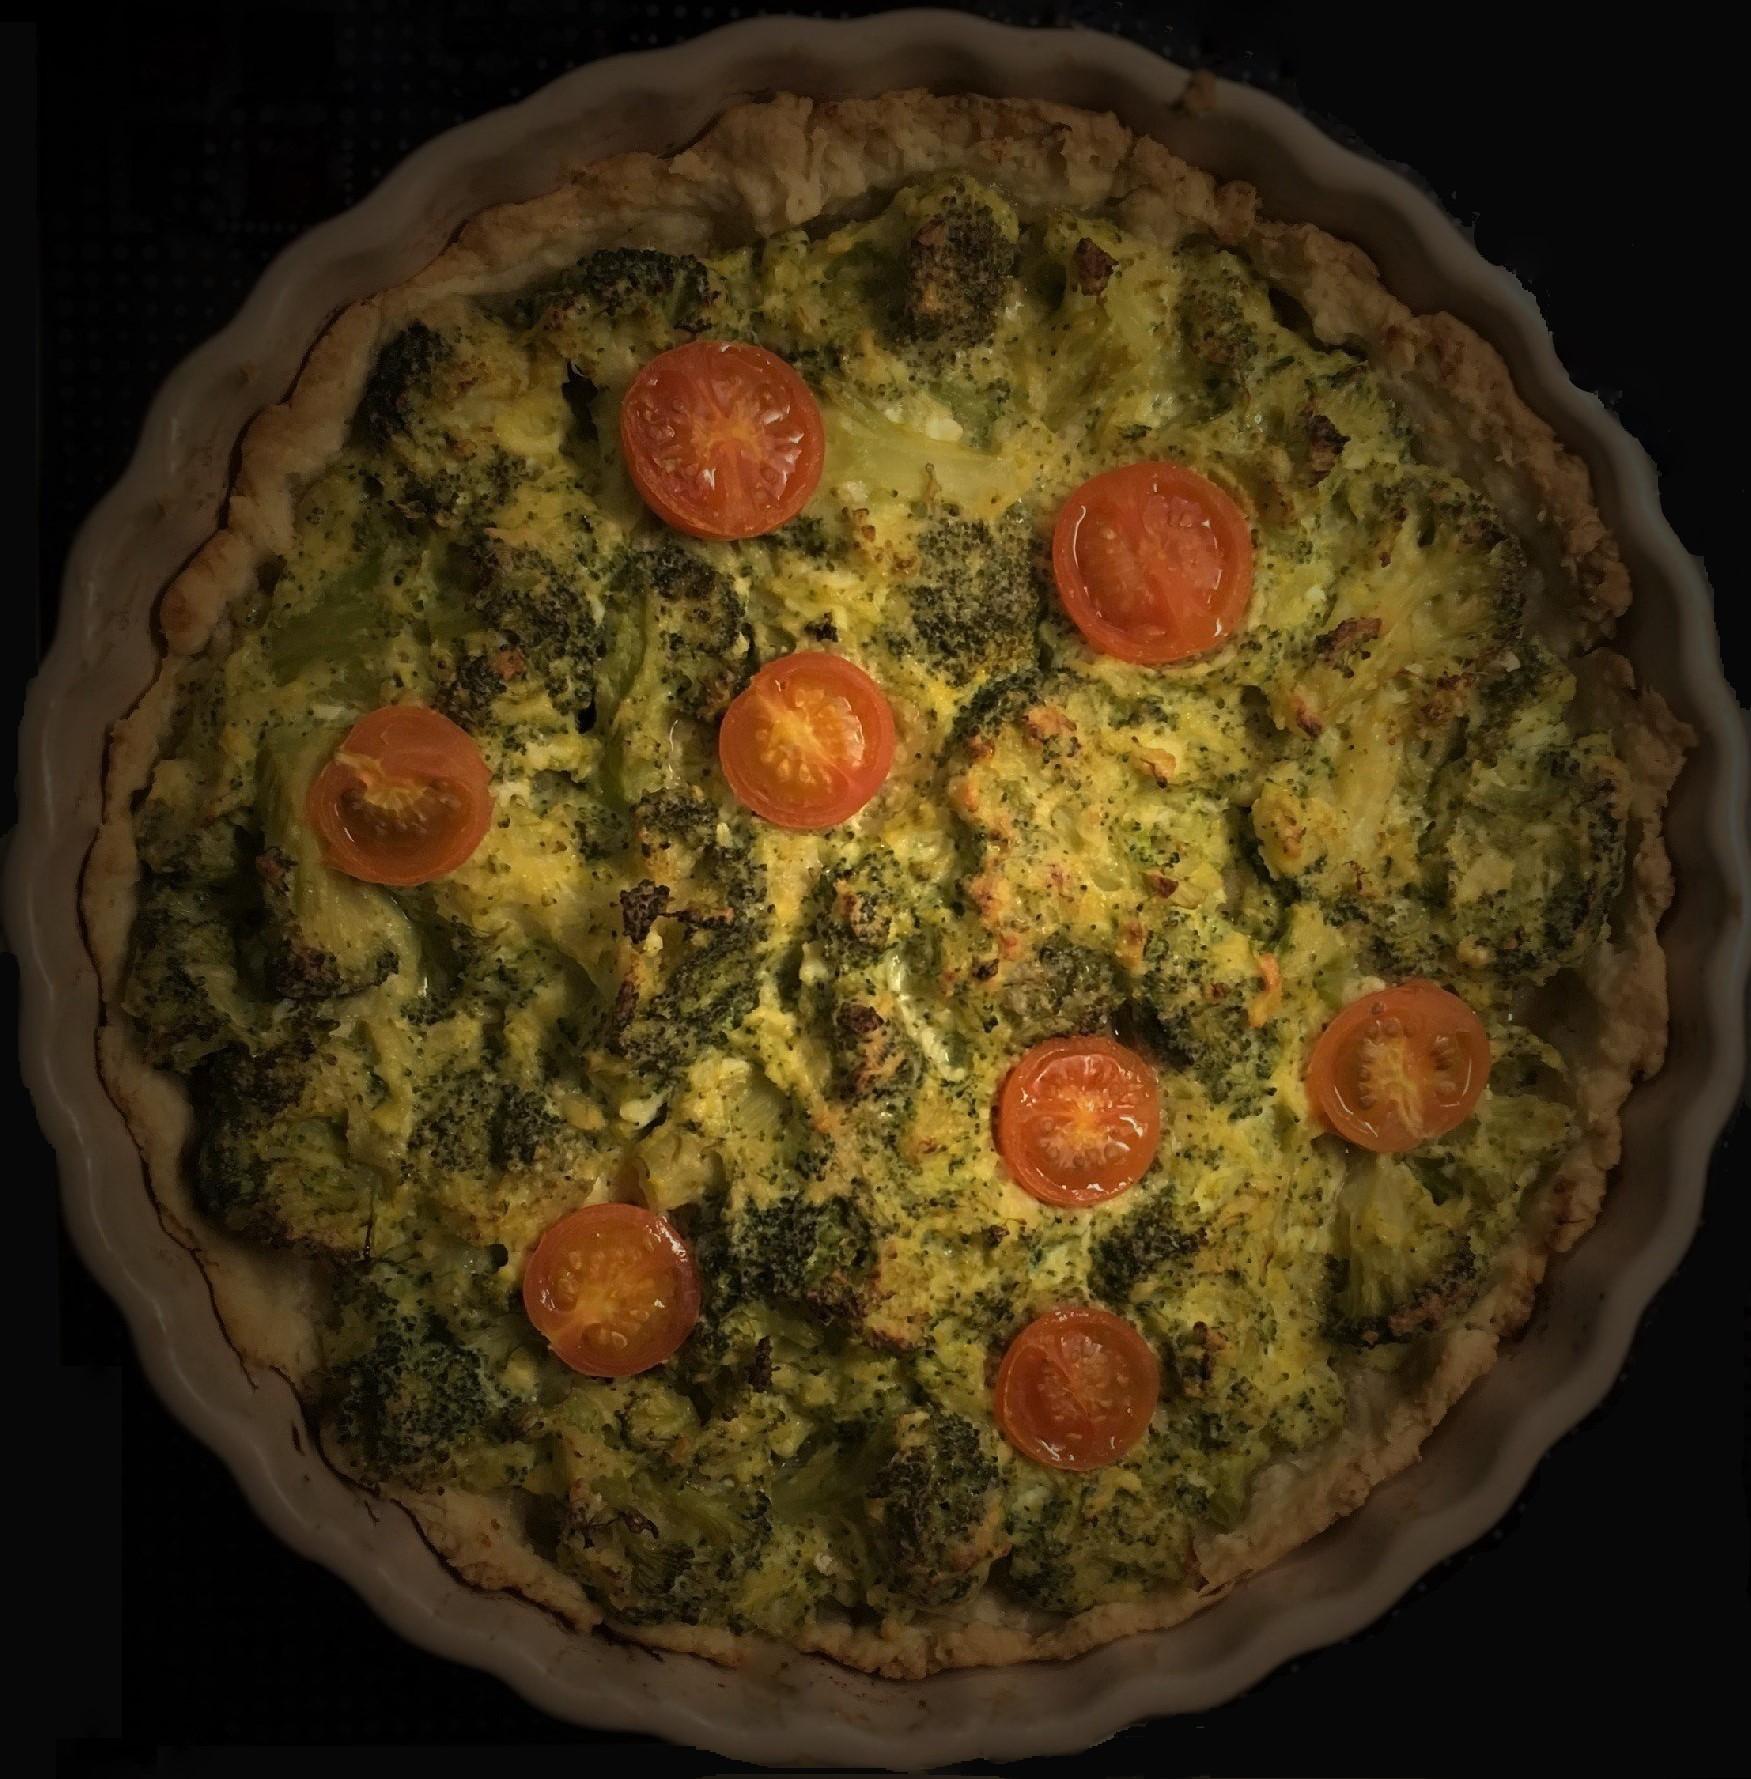 Broccolitærte opskrift, sund mad, hjertesund, SuperOtium, madplan